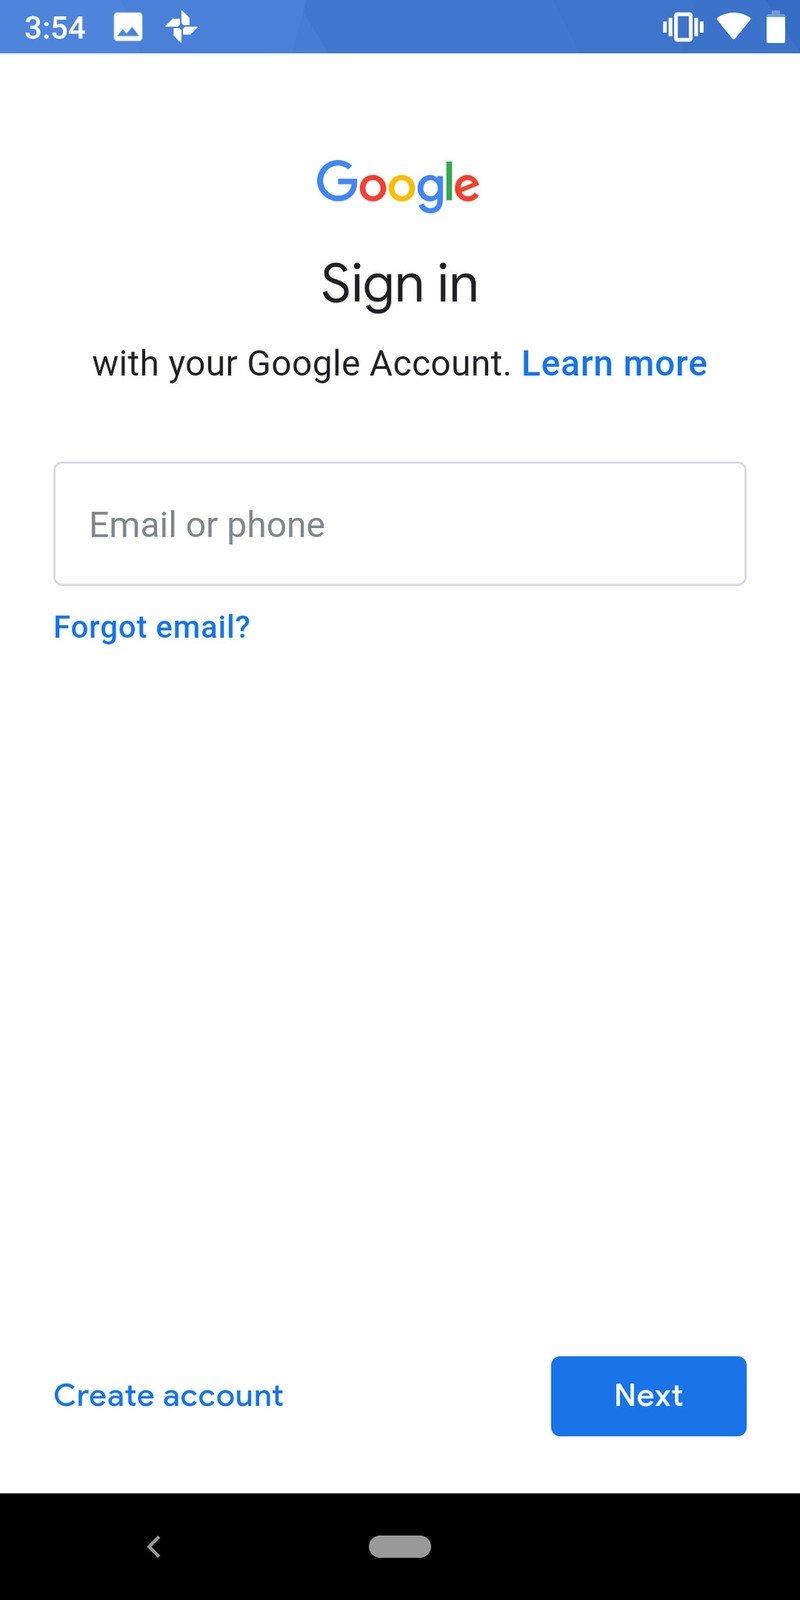 android-add-account-5.jpg?itok=1t48w9ZU